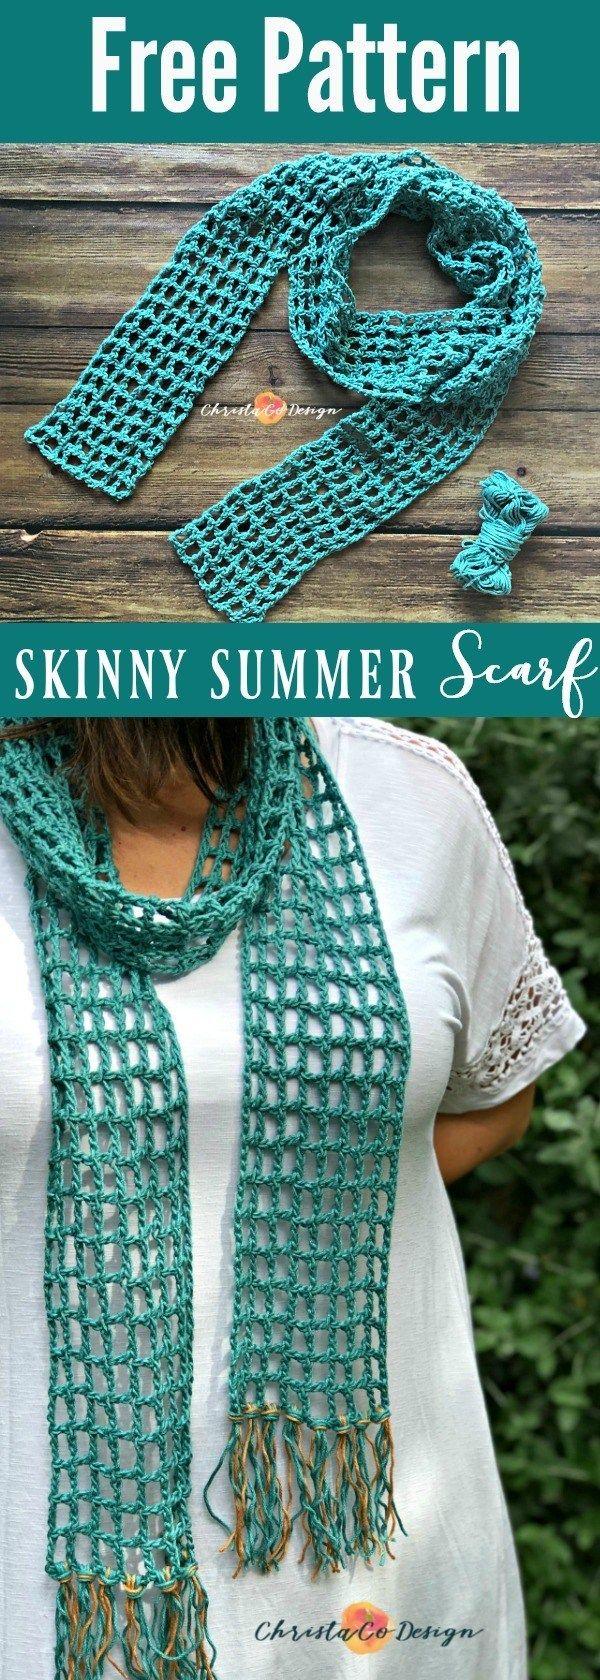 Skinny Summer Scarf Free Crochet Pattern #crochetscarves